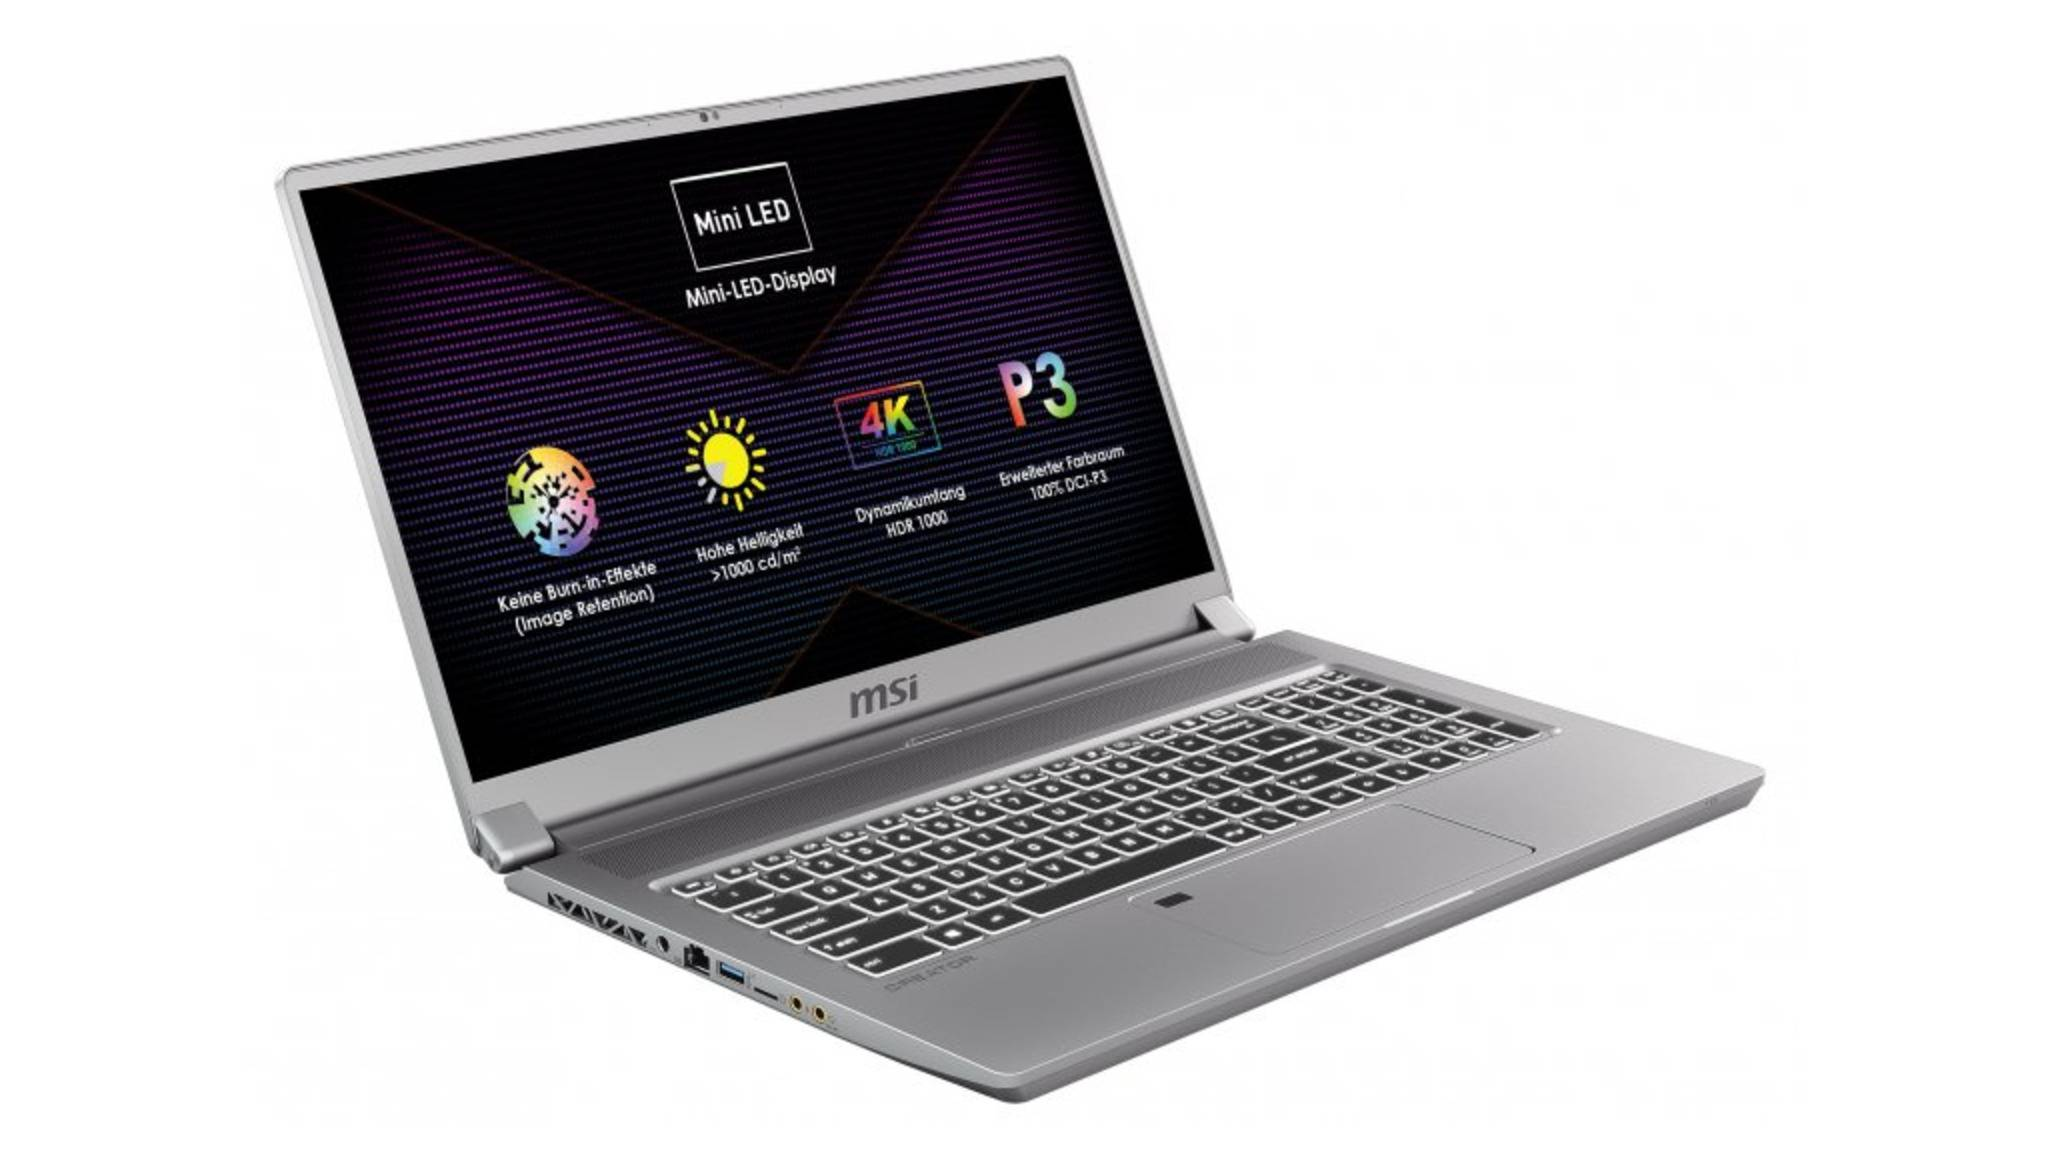 msi-creator-17-mini-led-laptop-notebook